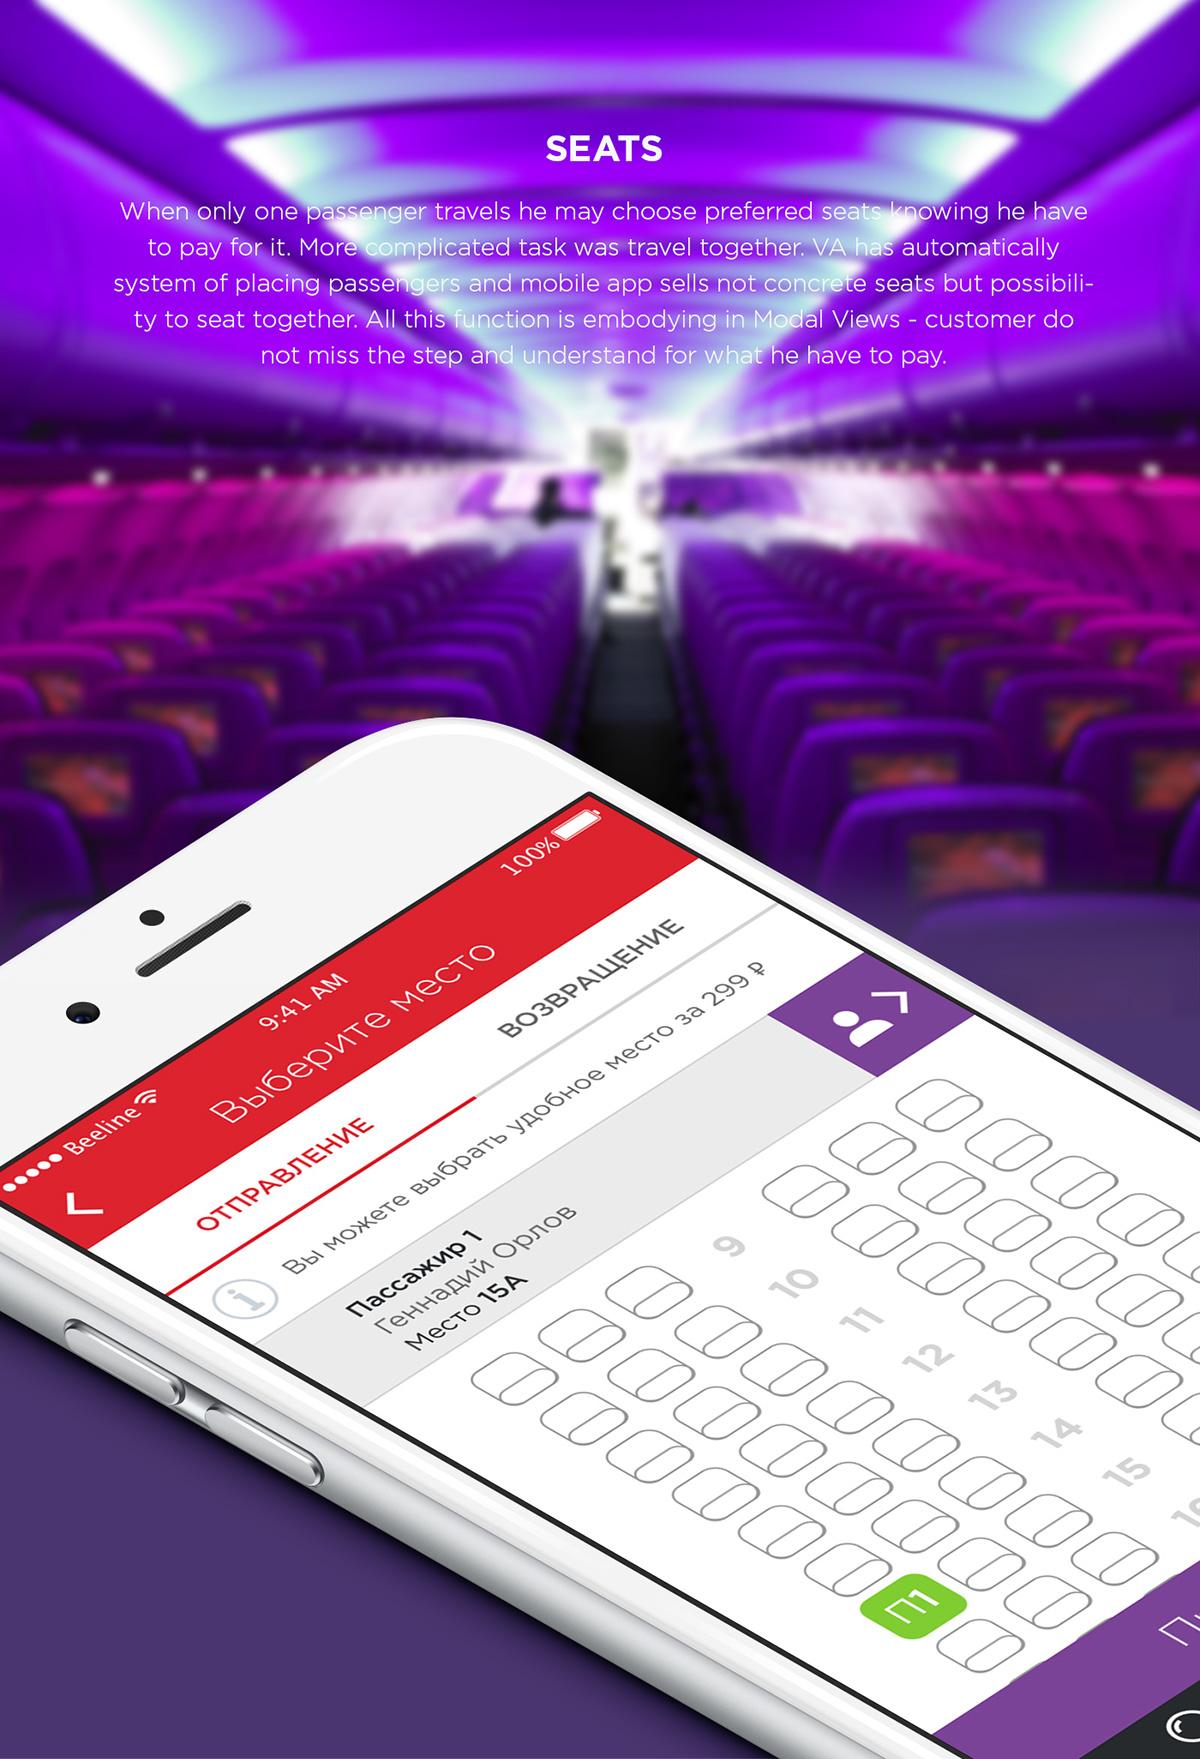 Virgin Australia App on Student Show